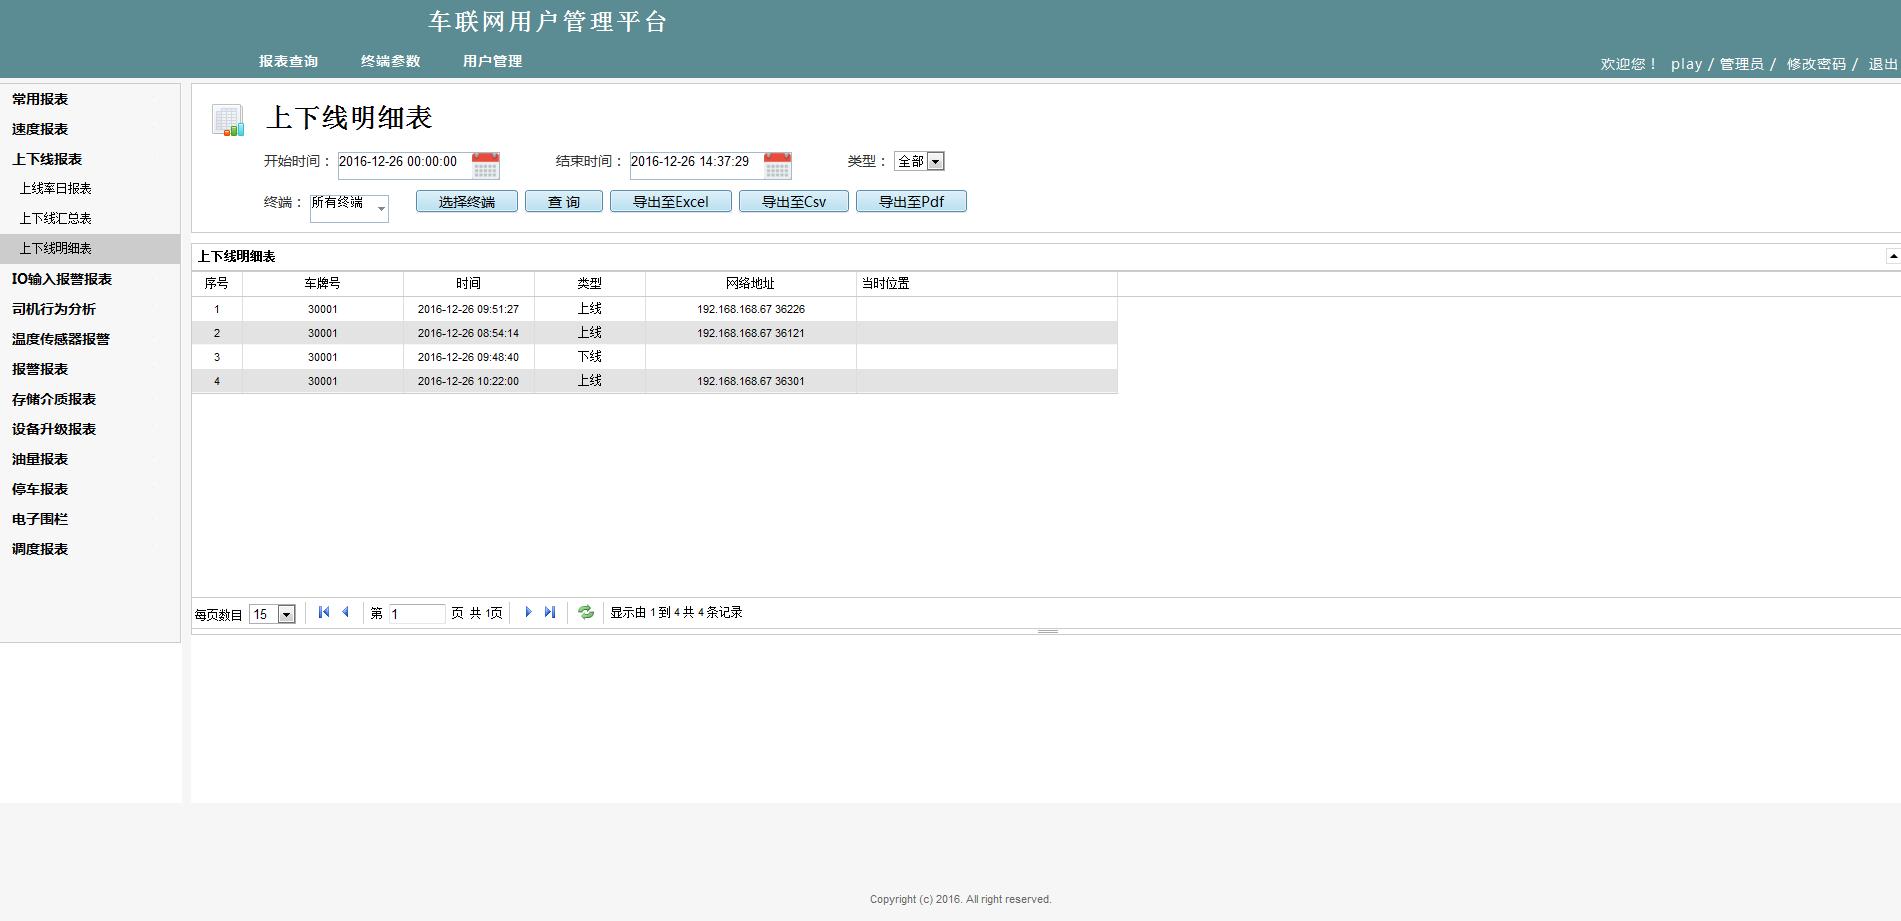 IVMS WEB客户端——智能车辆管理系统平台 第3张